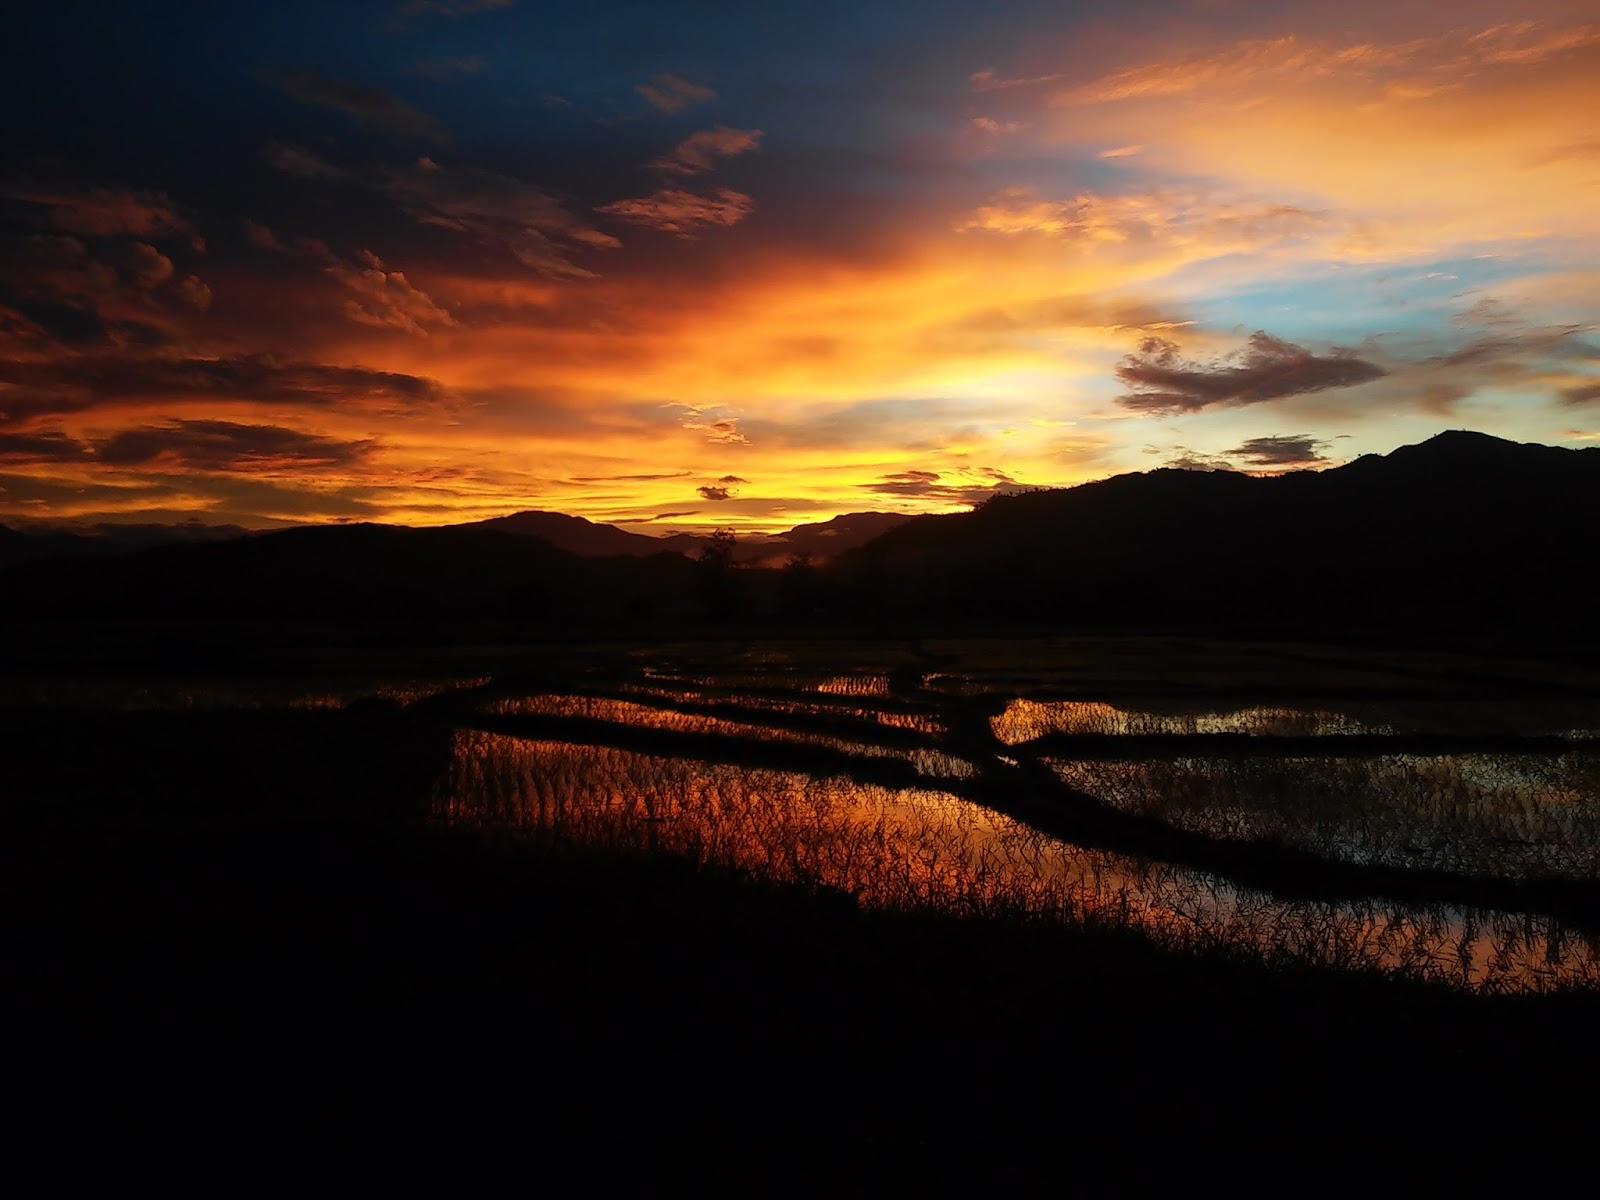 Carrangalan, Nueva Ecija